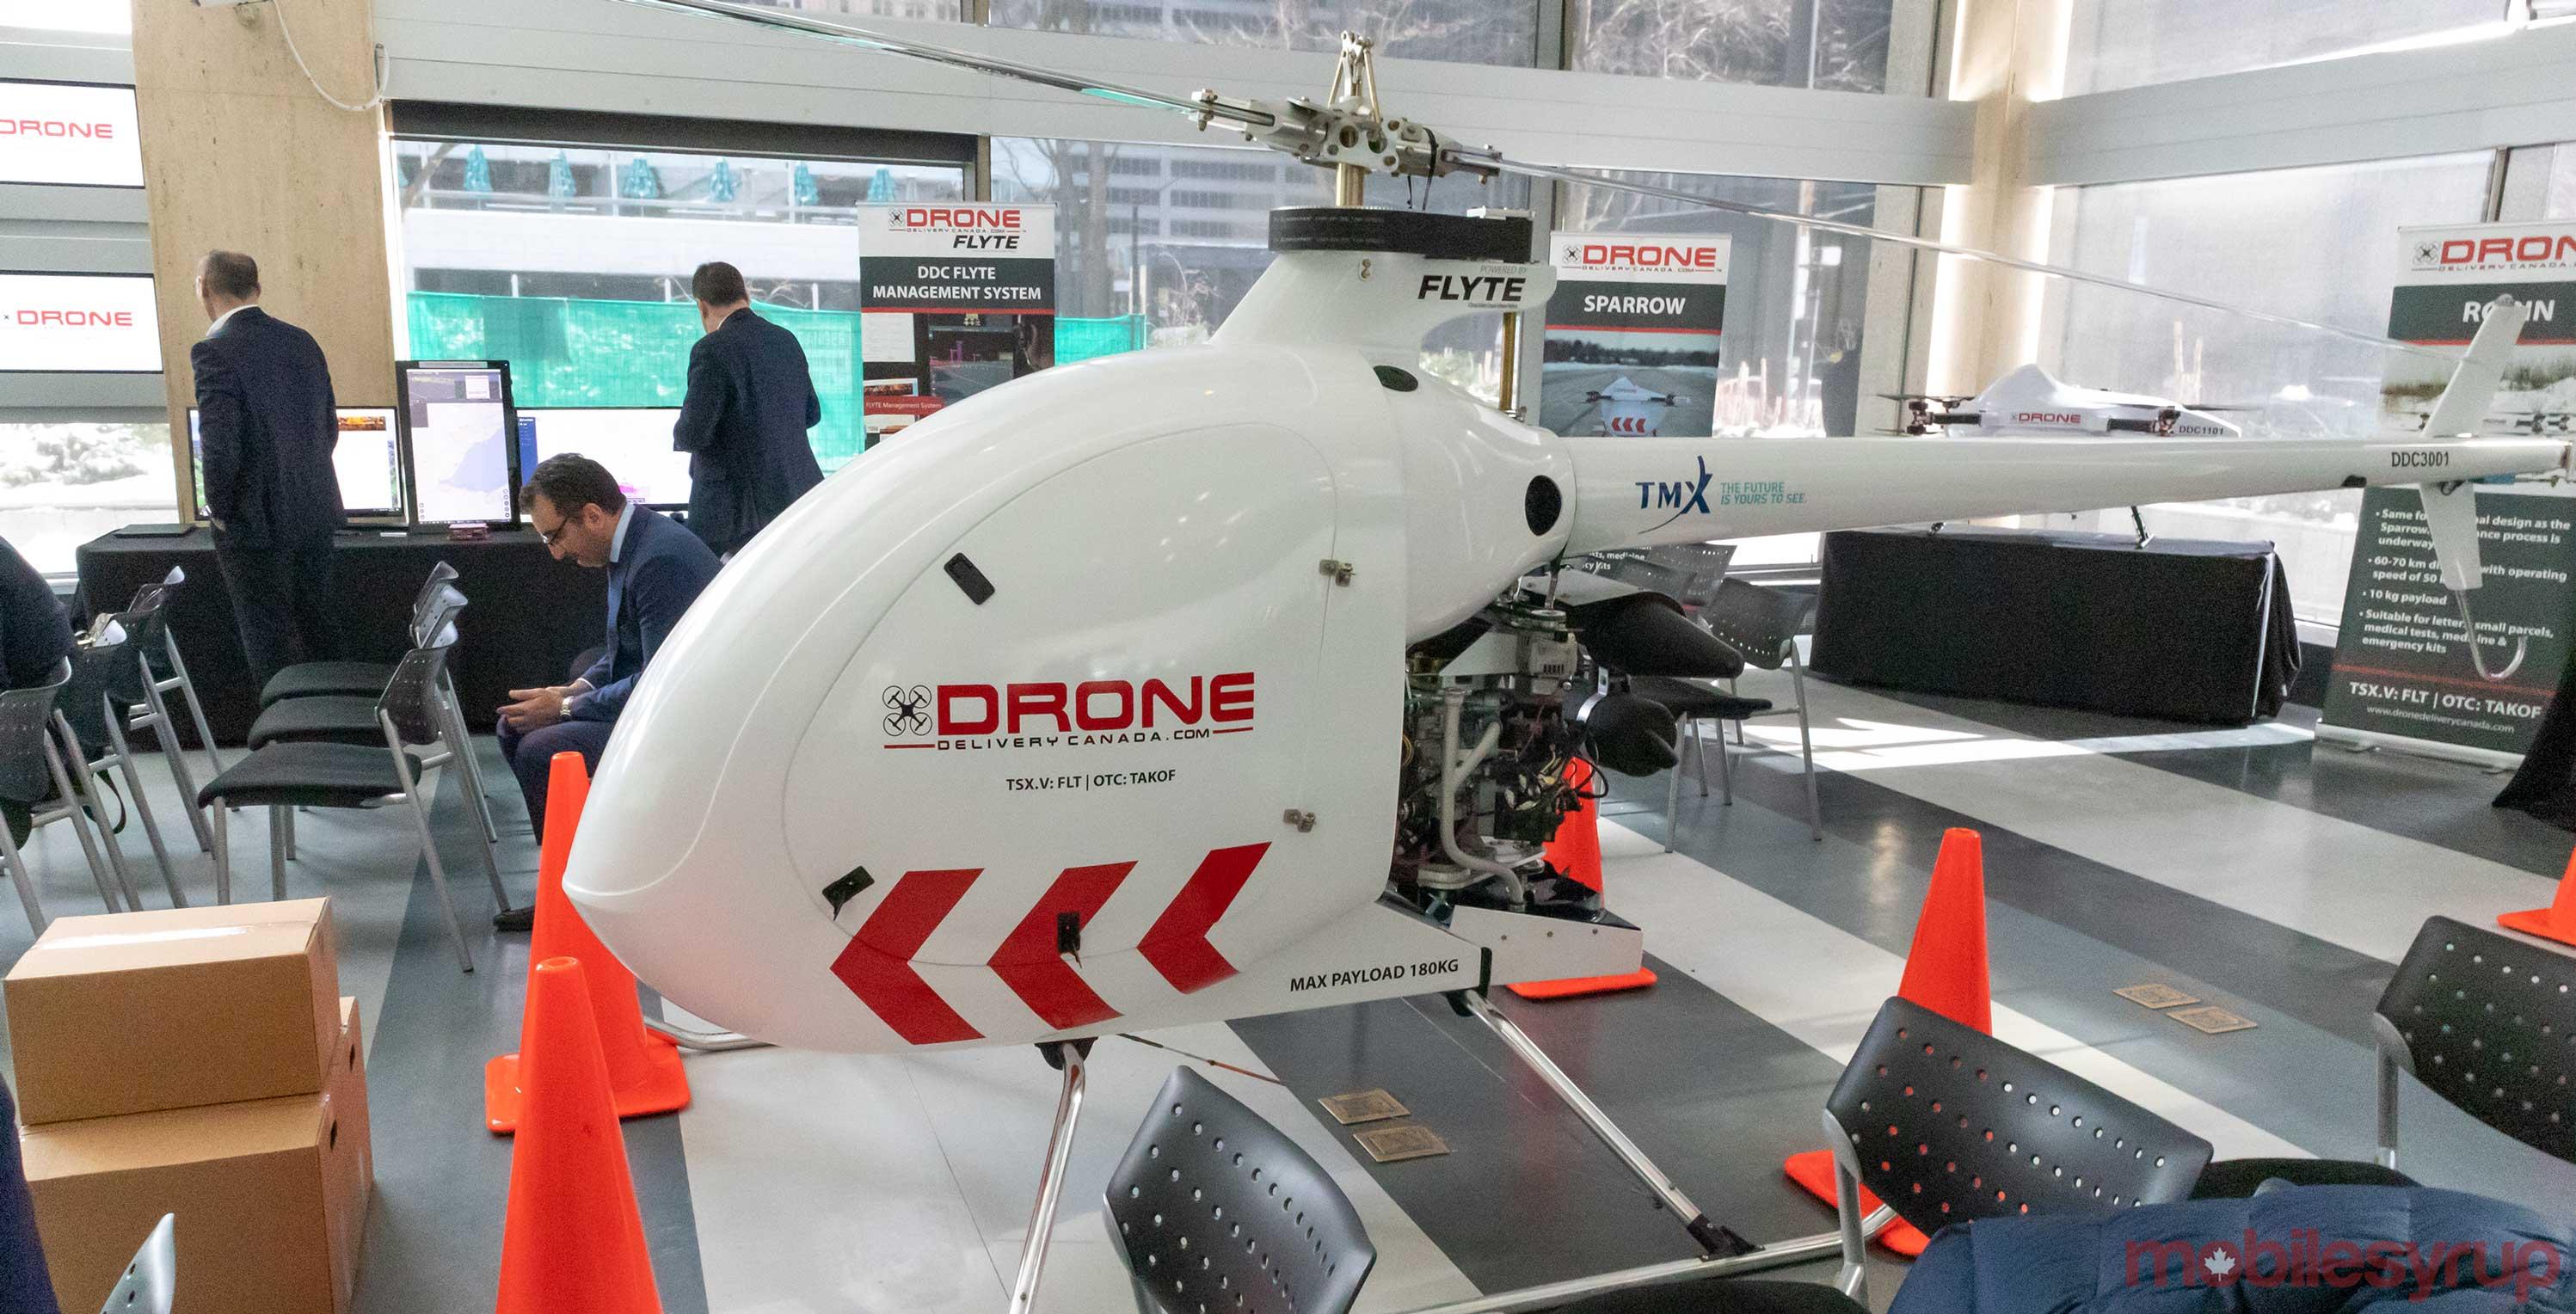 DDC Condor Drone via MobileSyrup